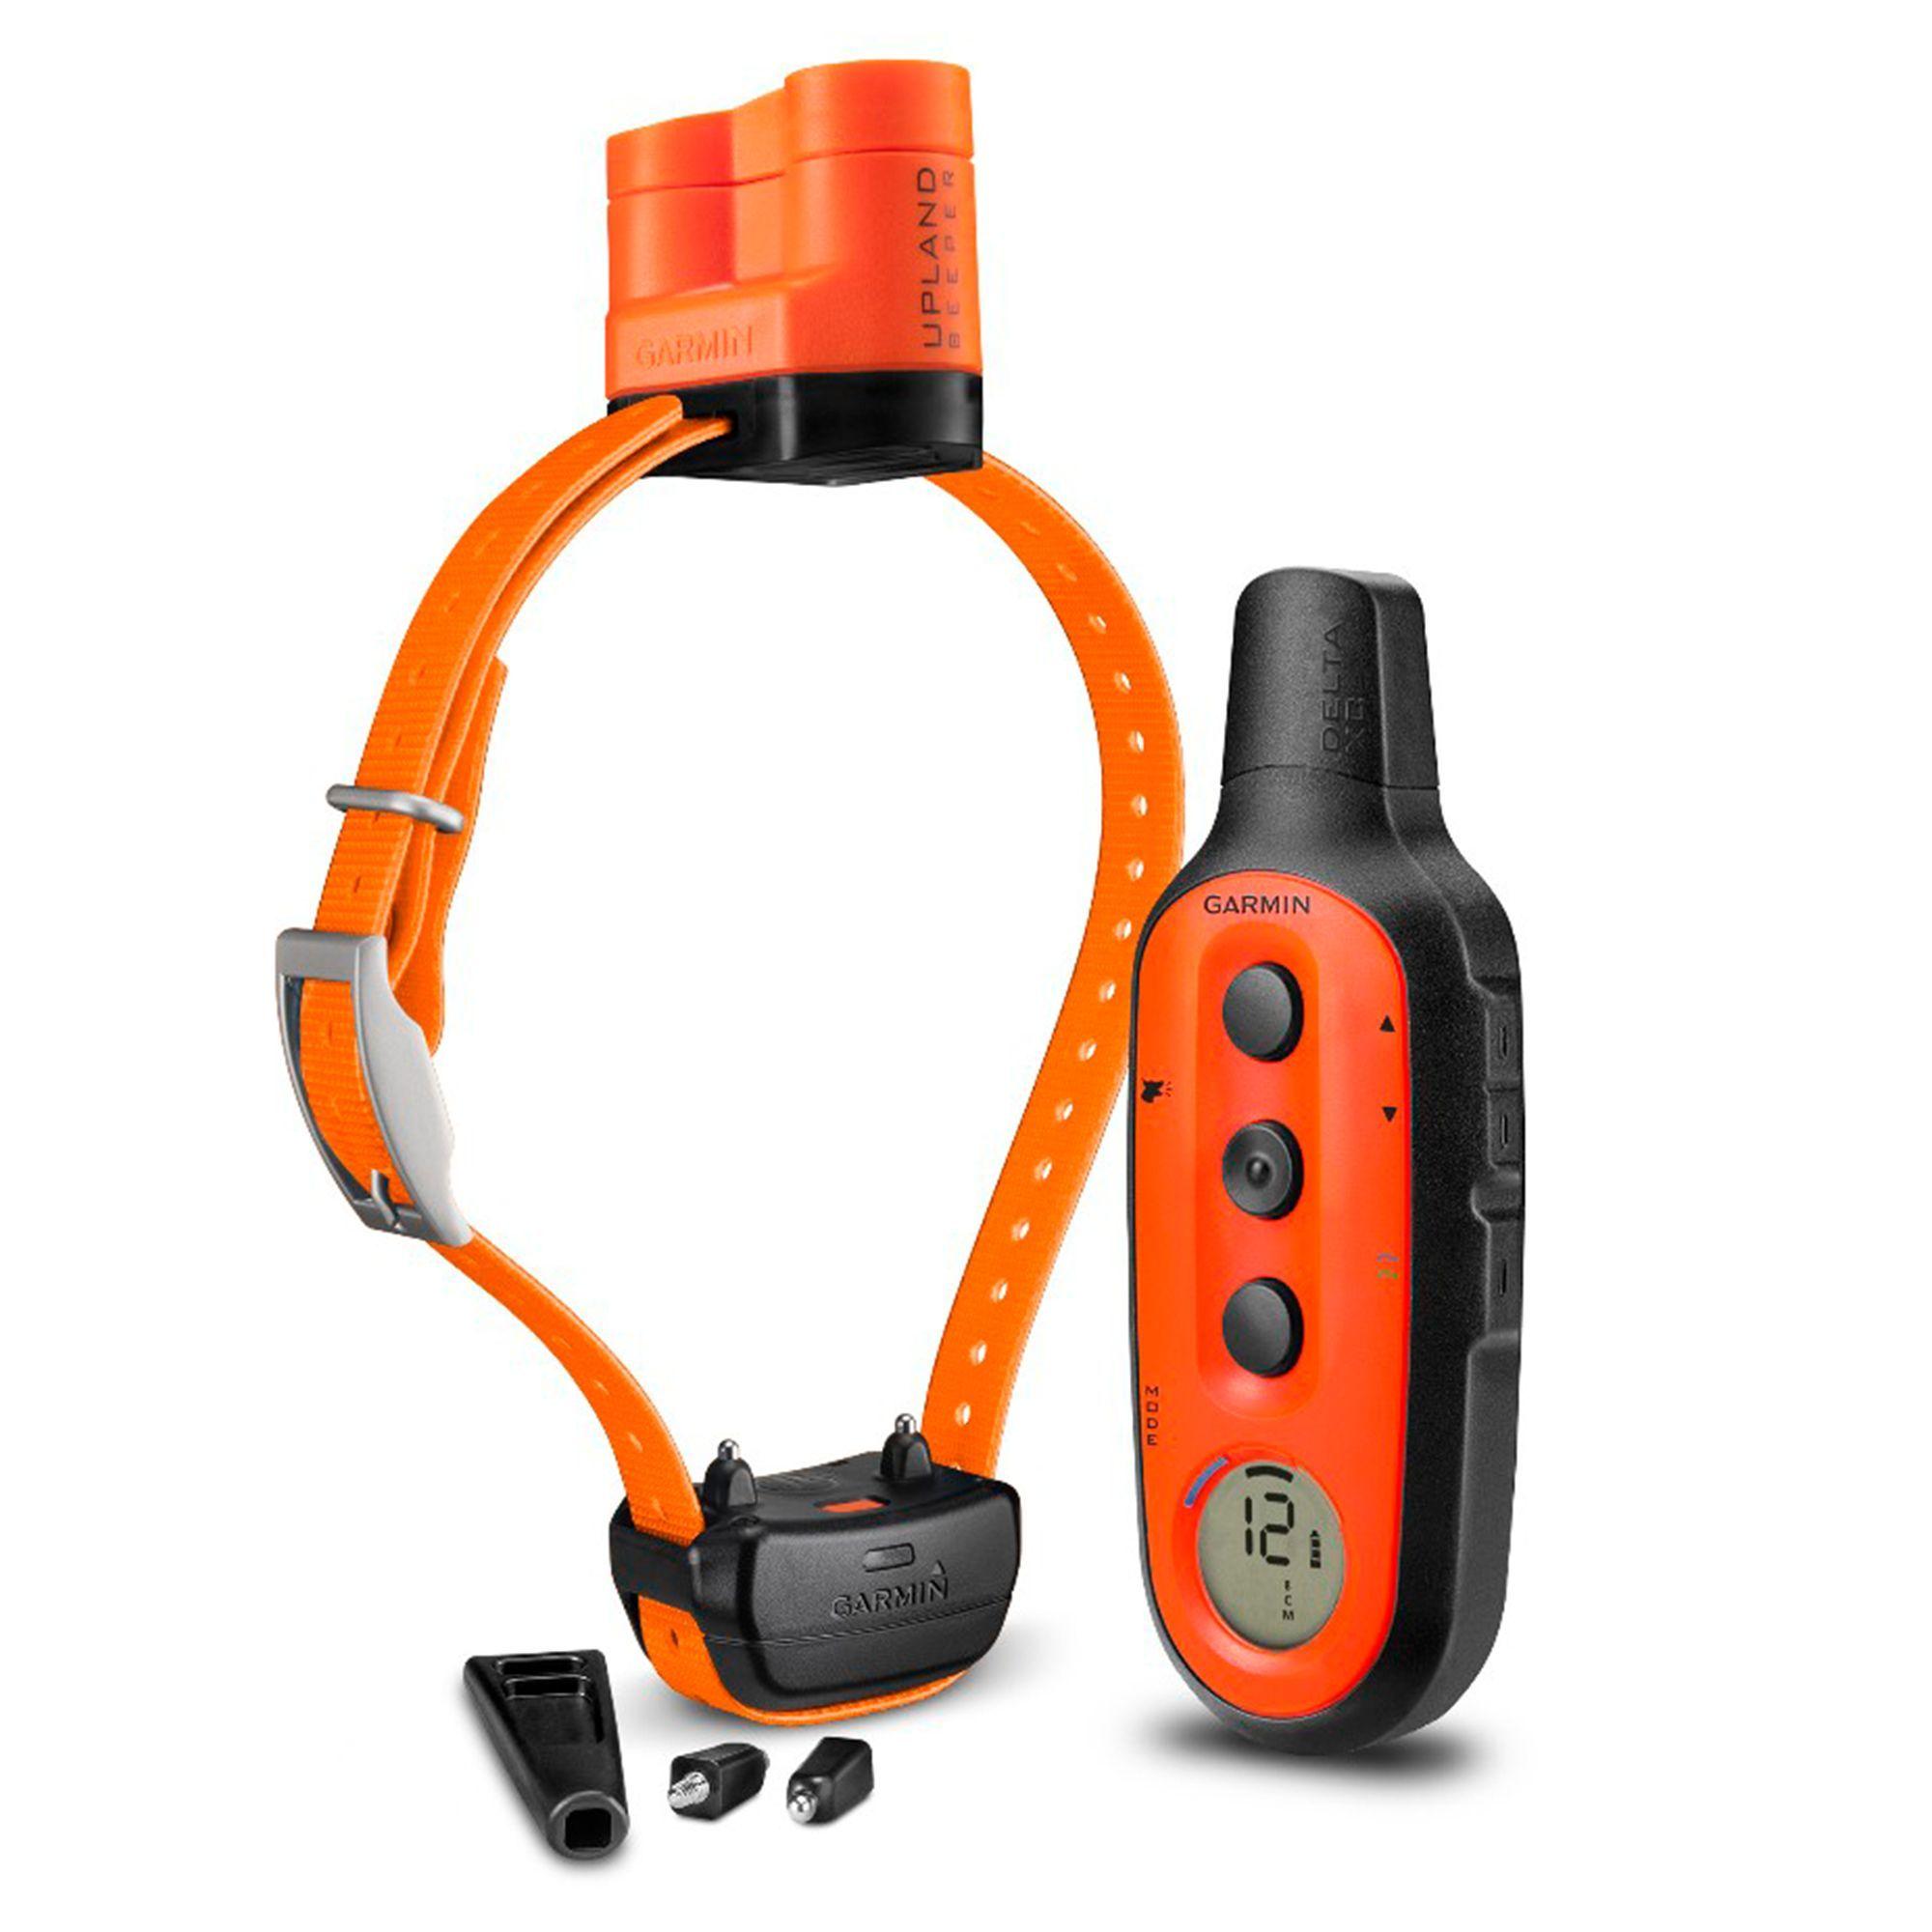 Garmin Delta Upland Xc Remote Dog Trainer Size One Size Orange